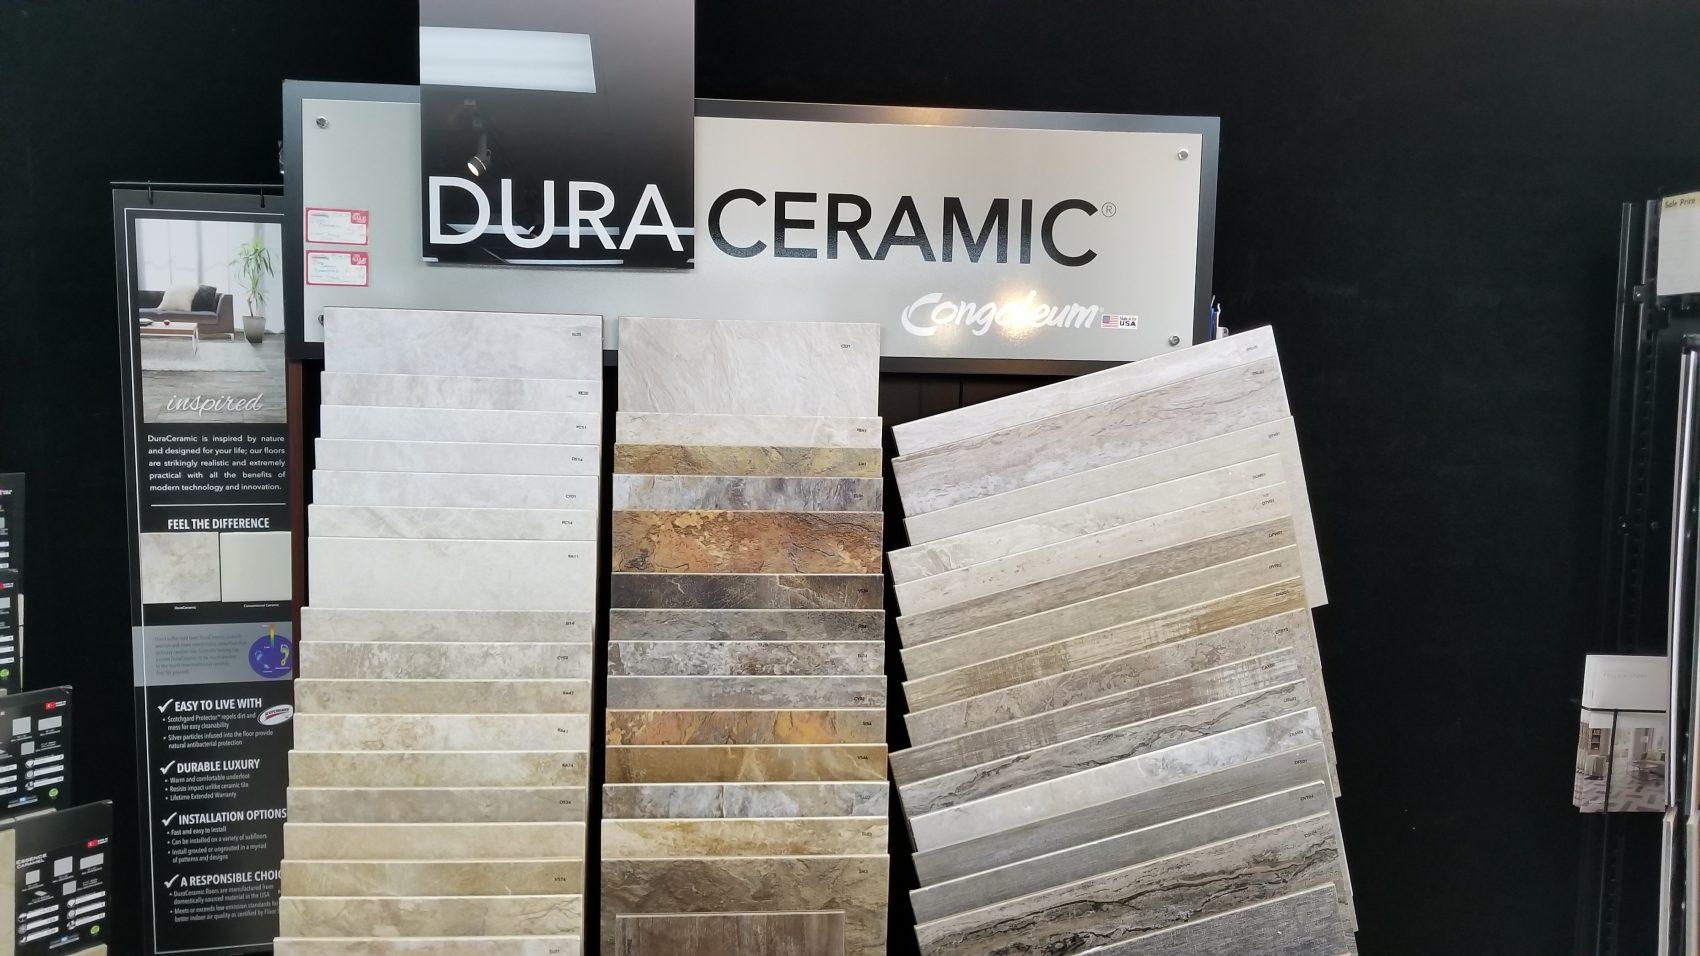 Dura Ceramic Tile Display Bodamers Carpets Plus Of Traverse City